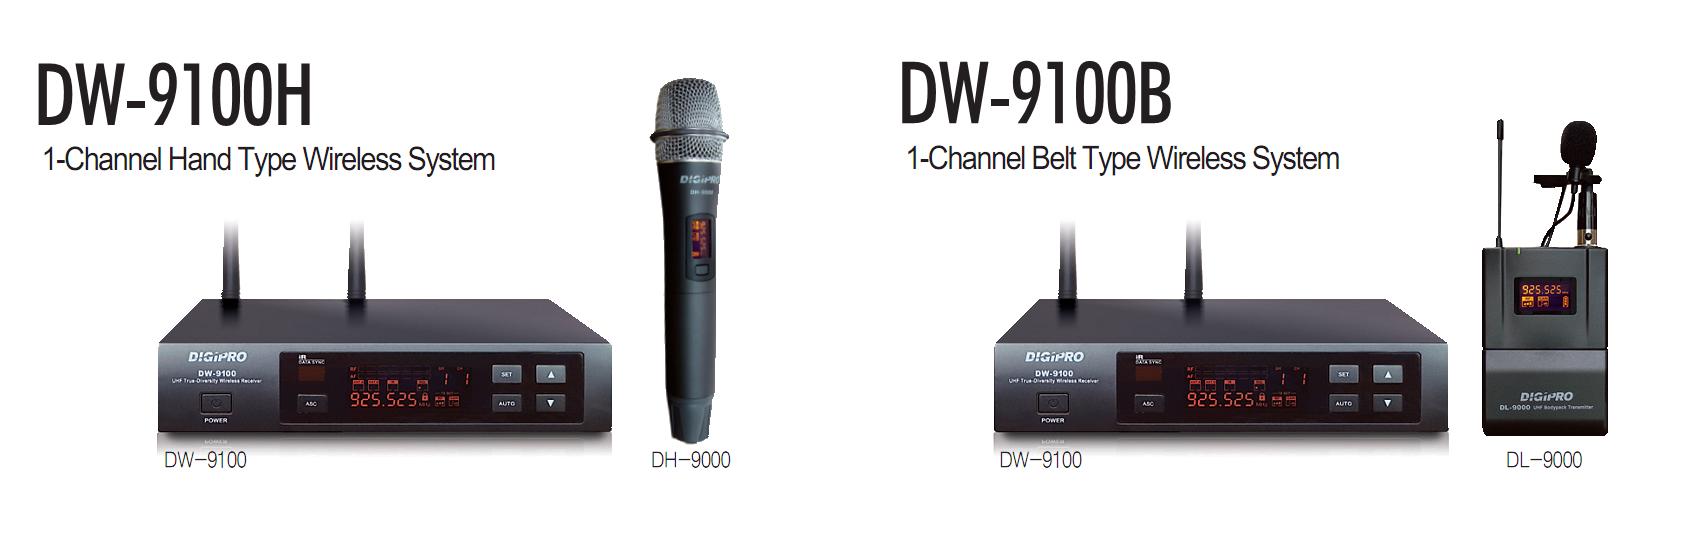 DW-9100 시리즈 사진.png